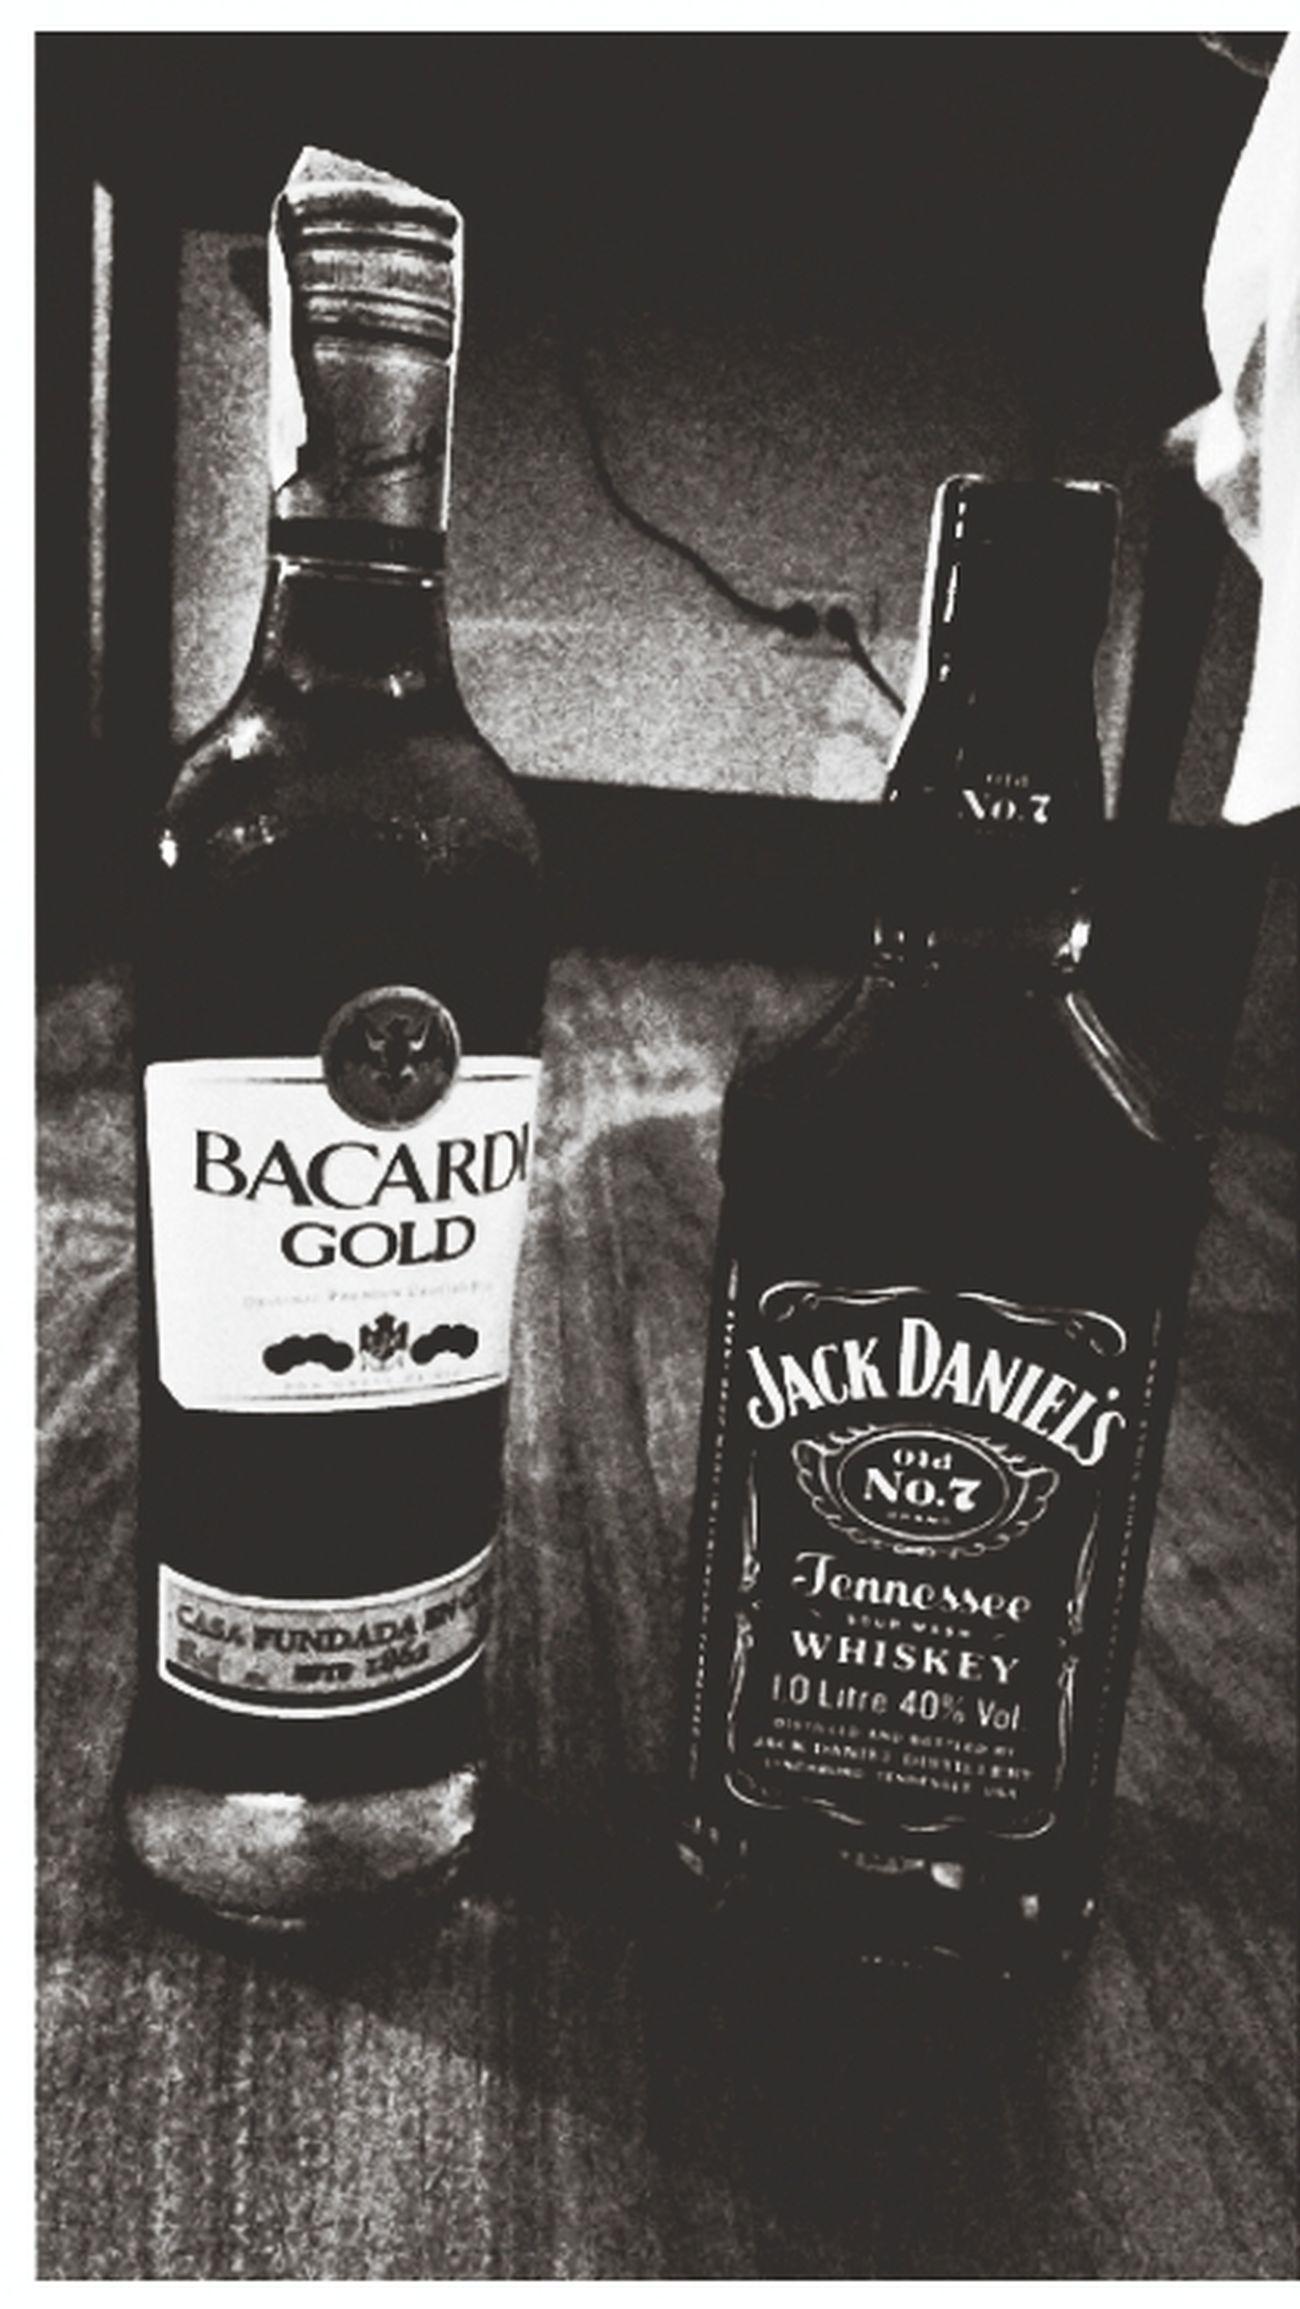 Booze night... Bacardi  Jackdaniels Booze